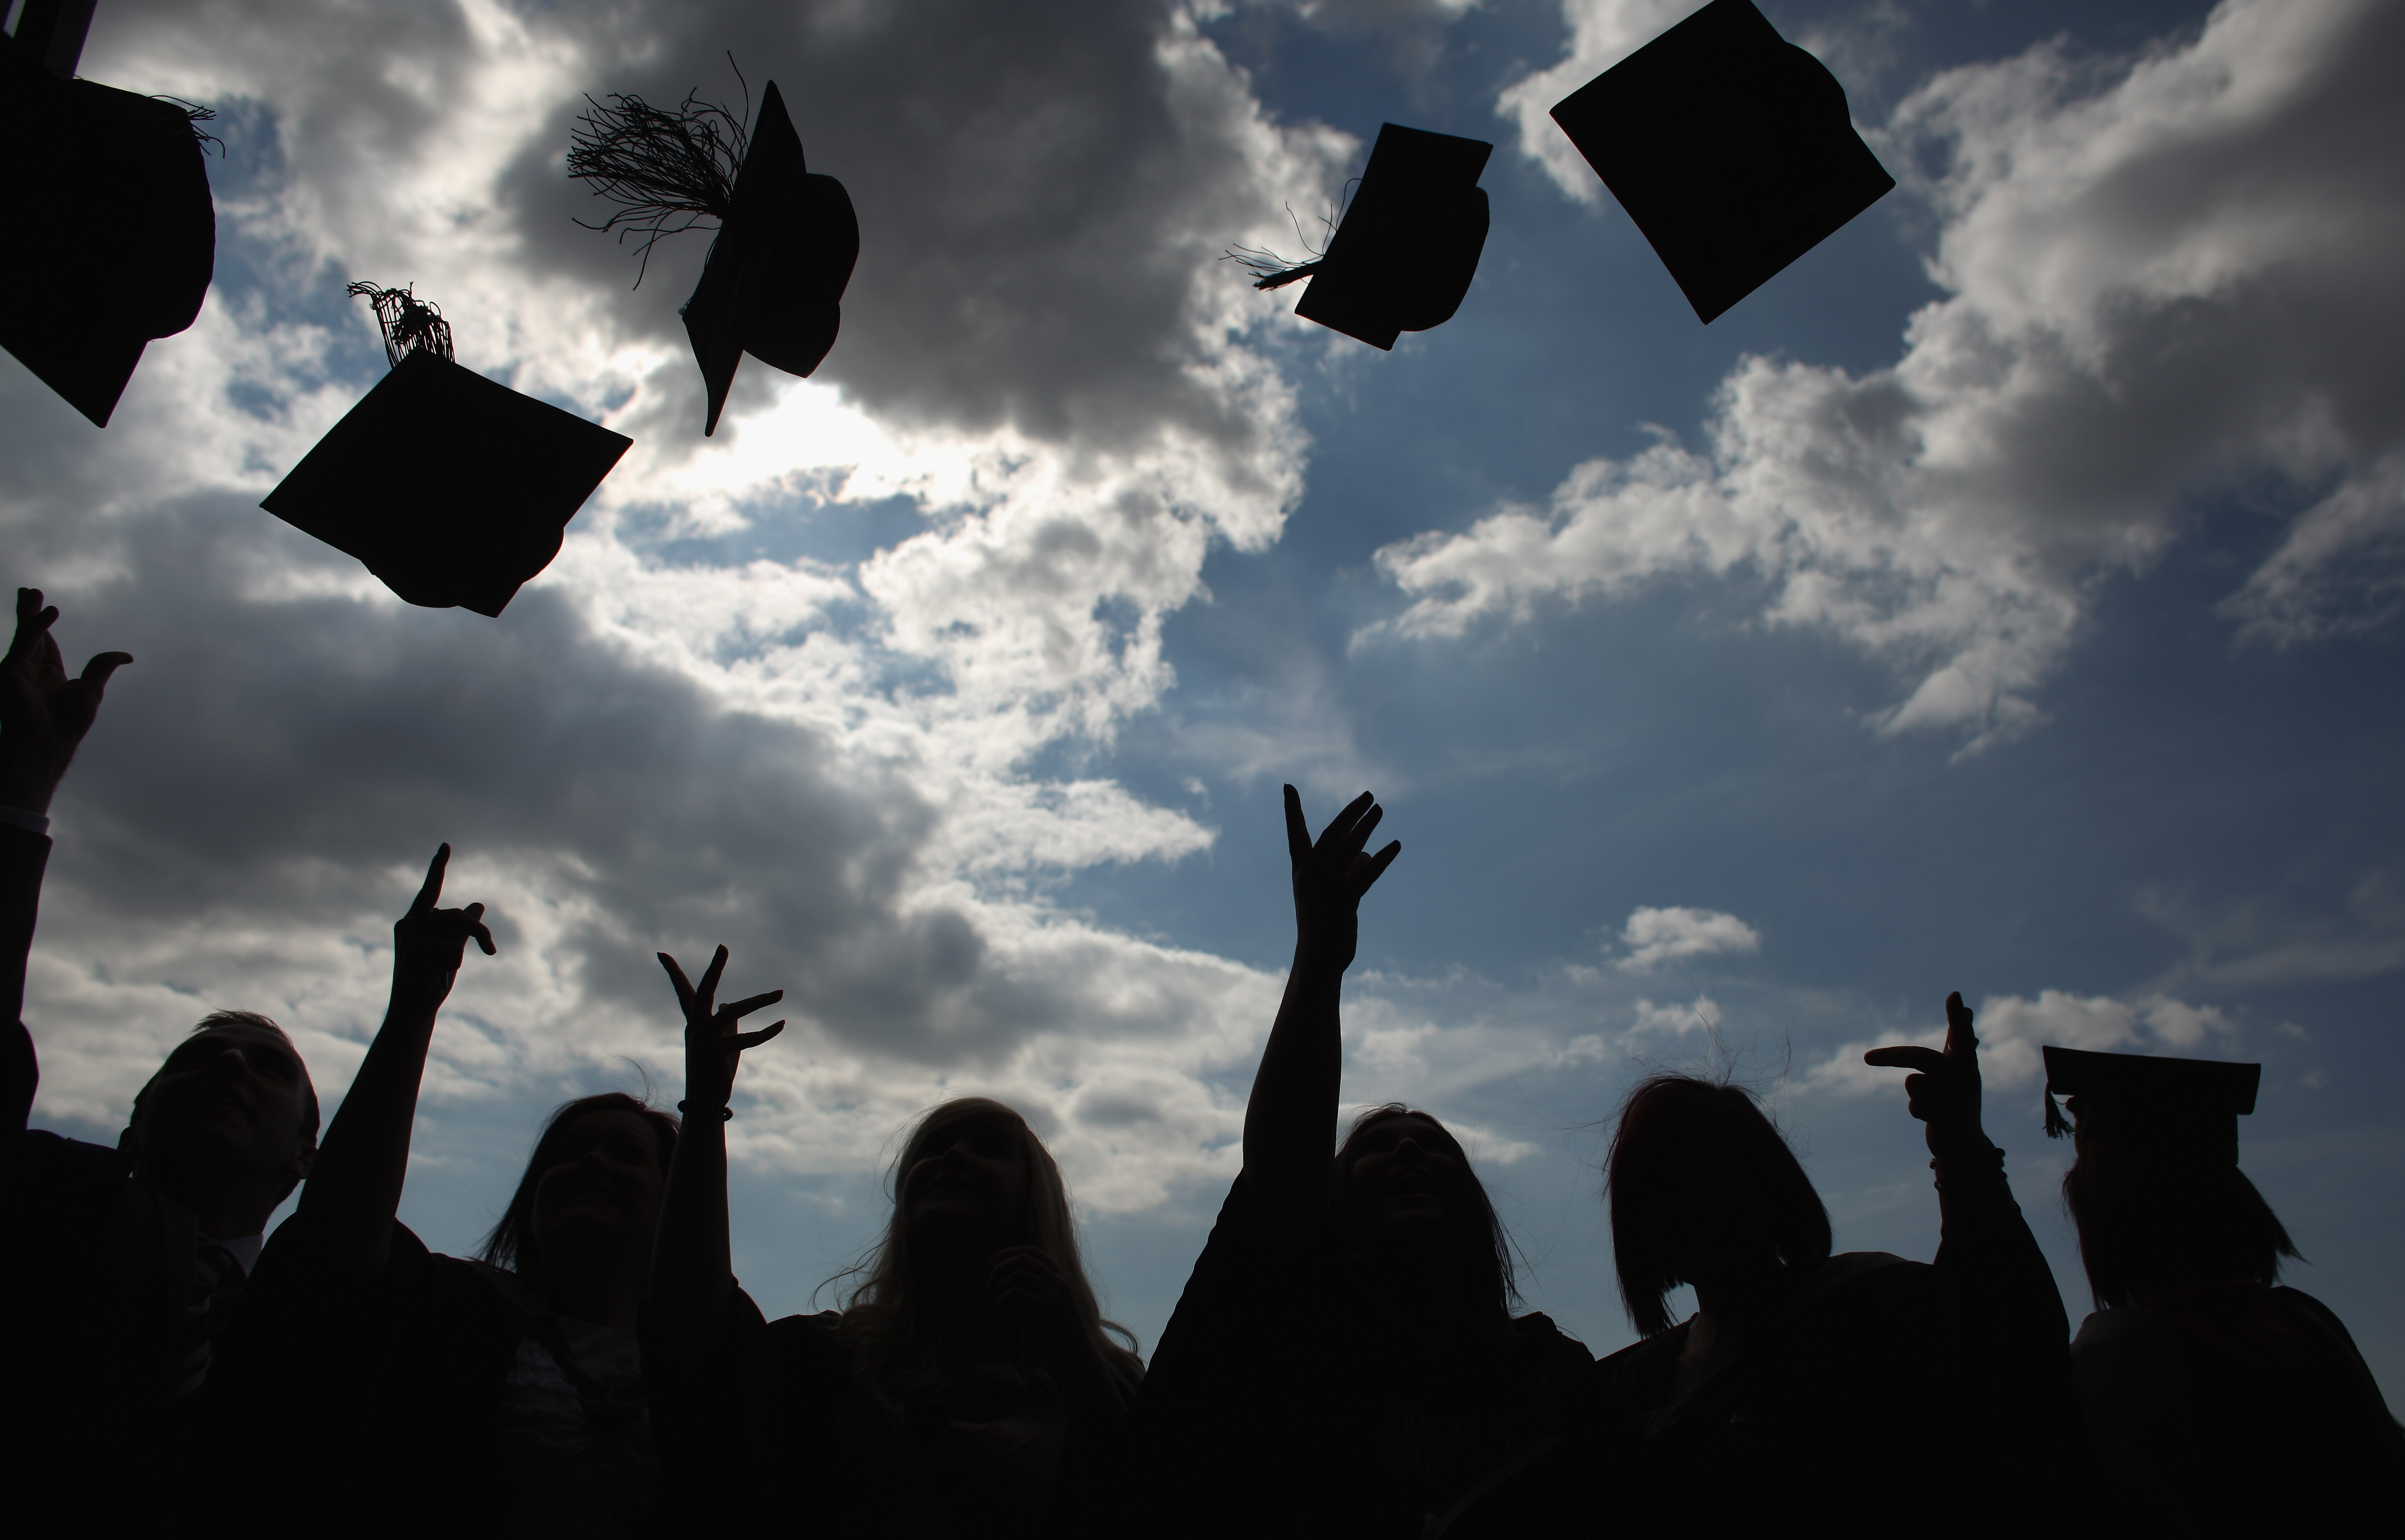 College majors matter for future paychecks